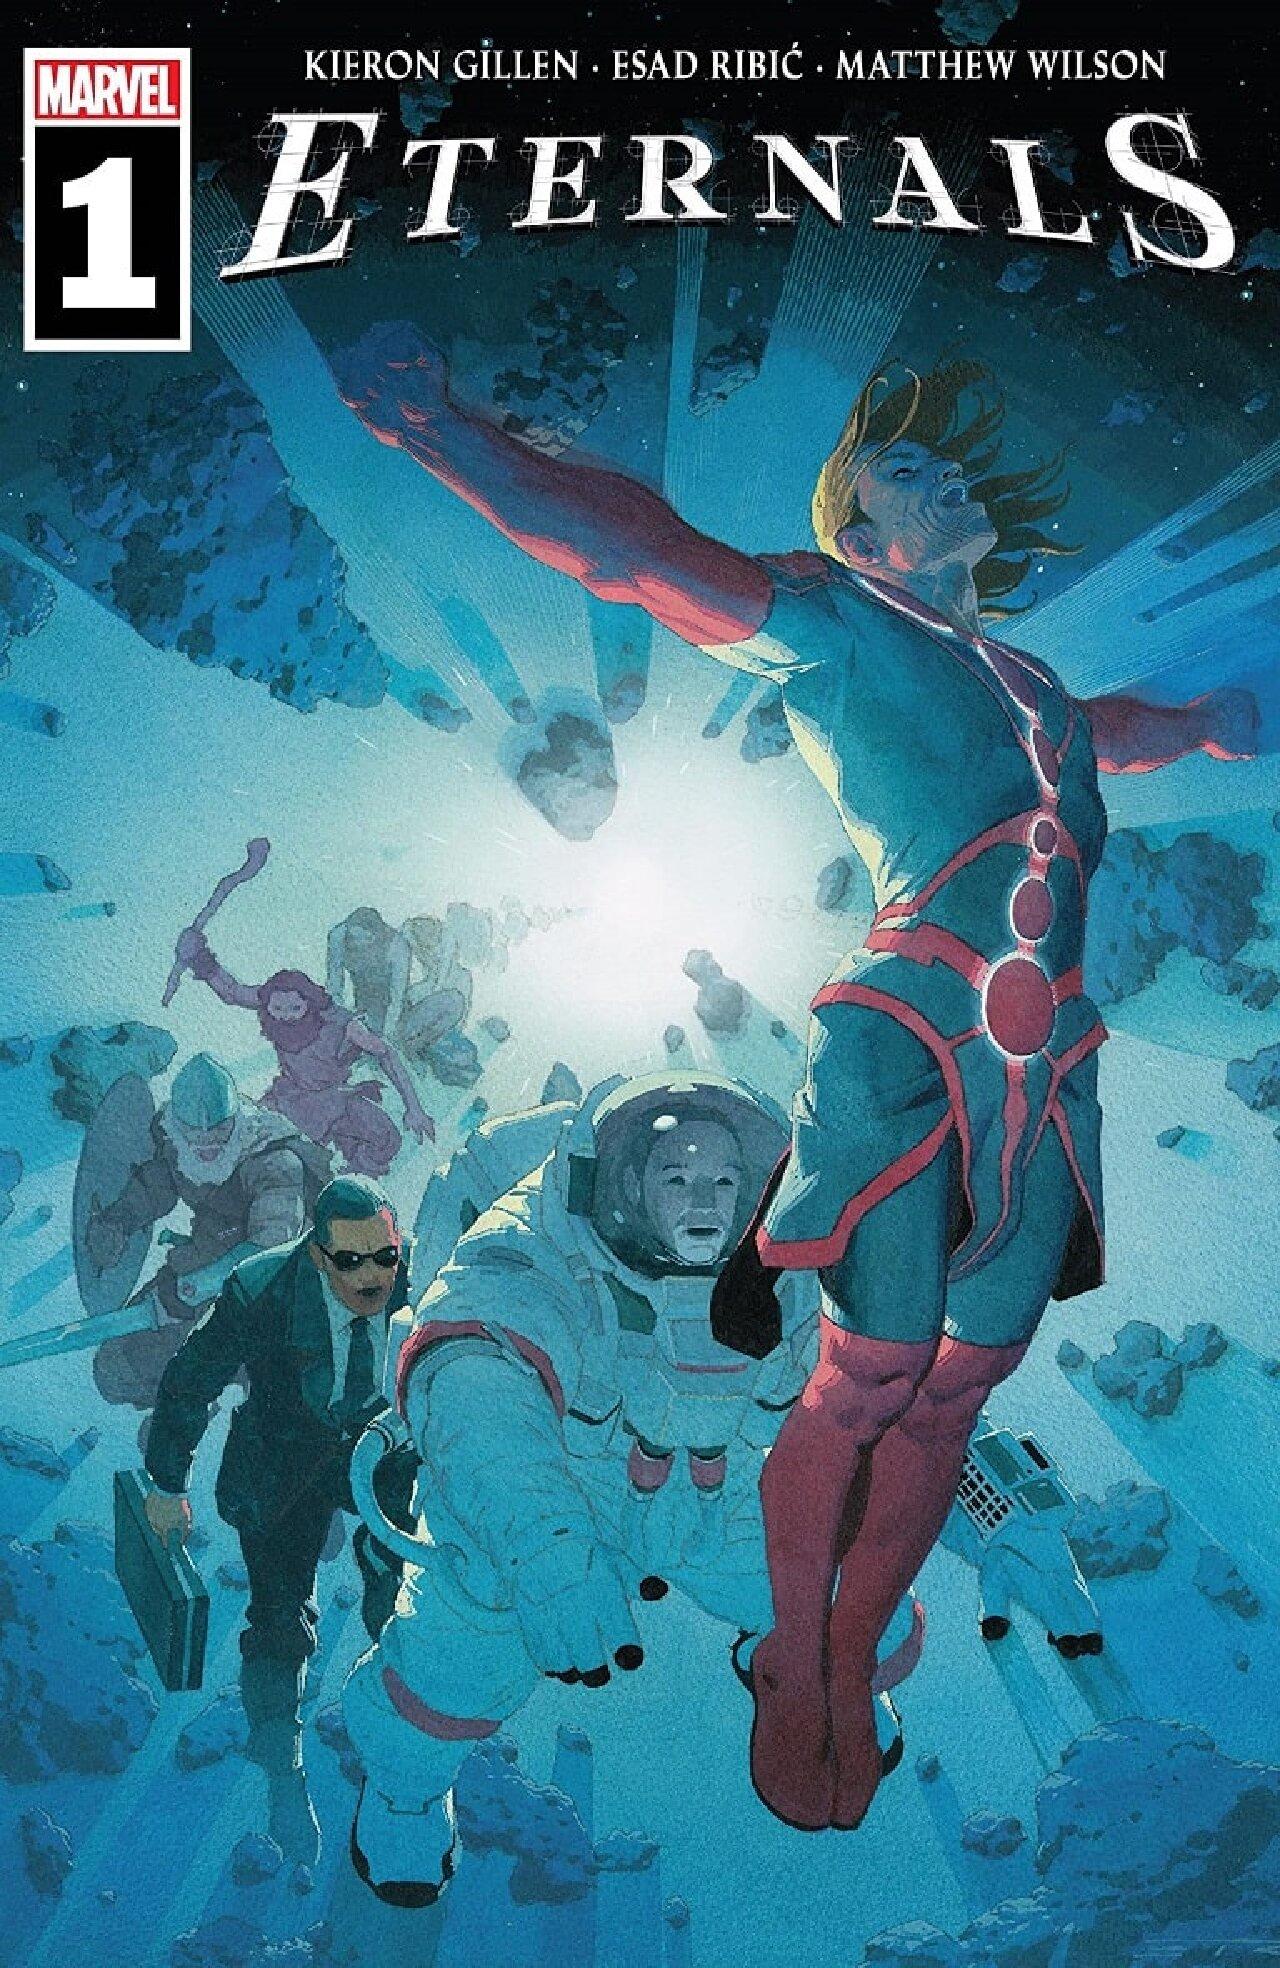 eternals esad ribic serie marvel comics